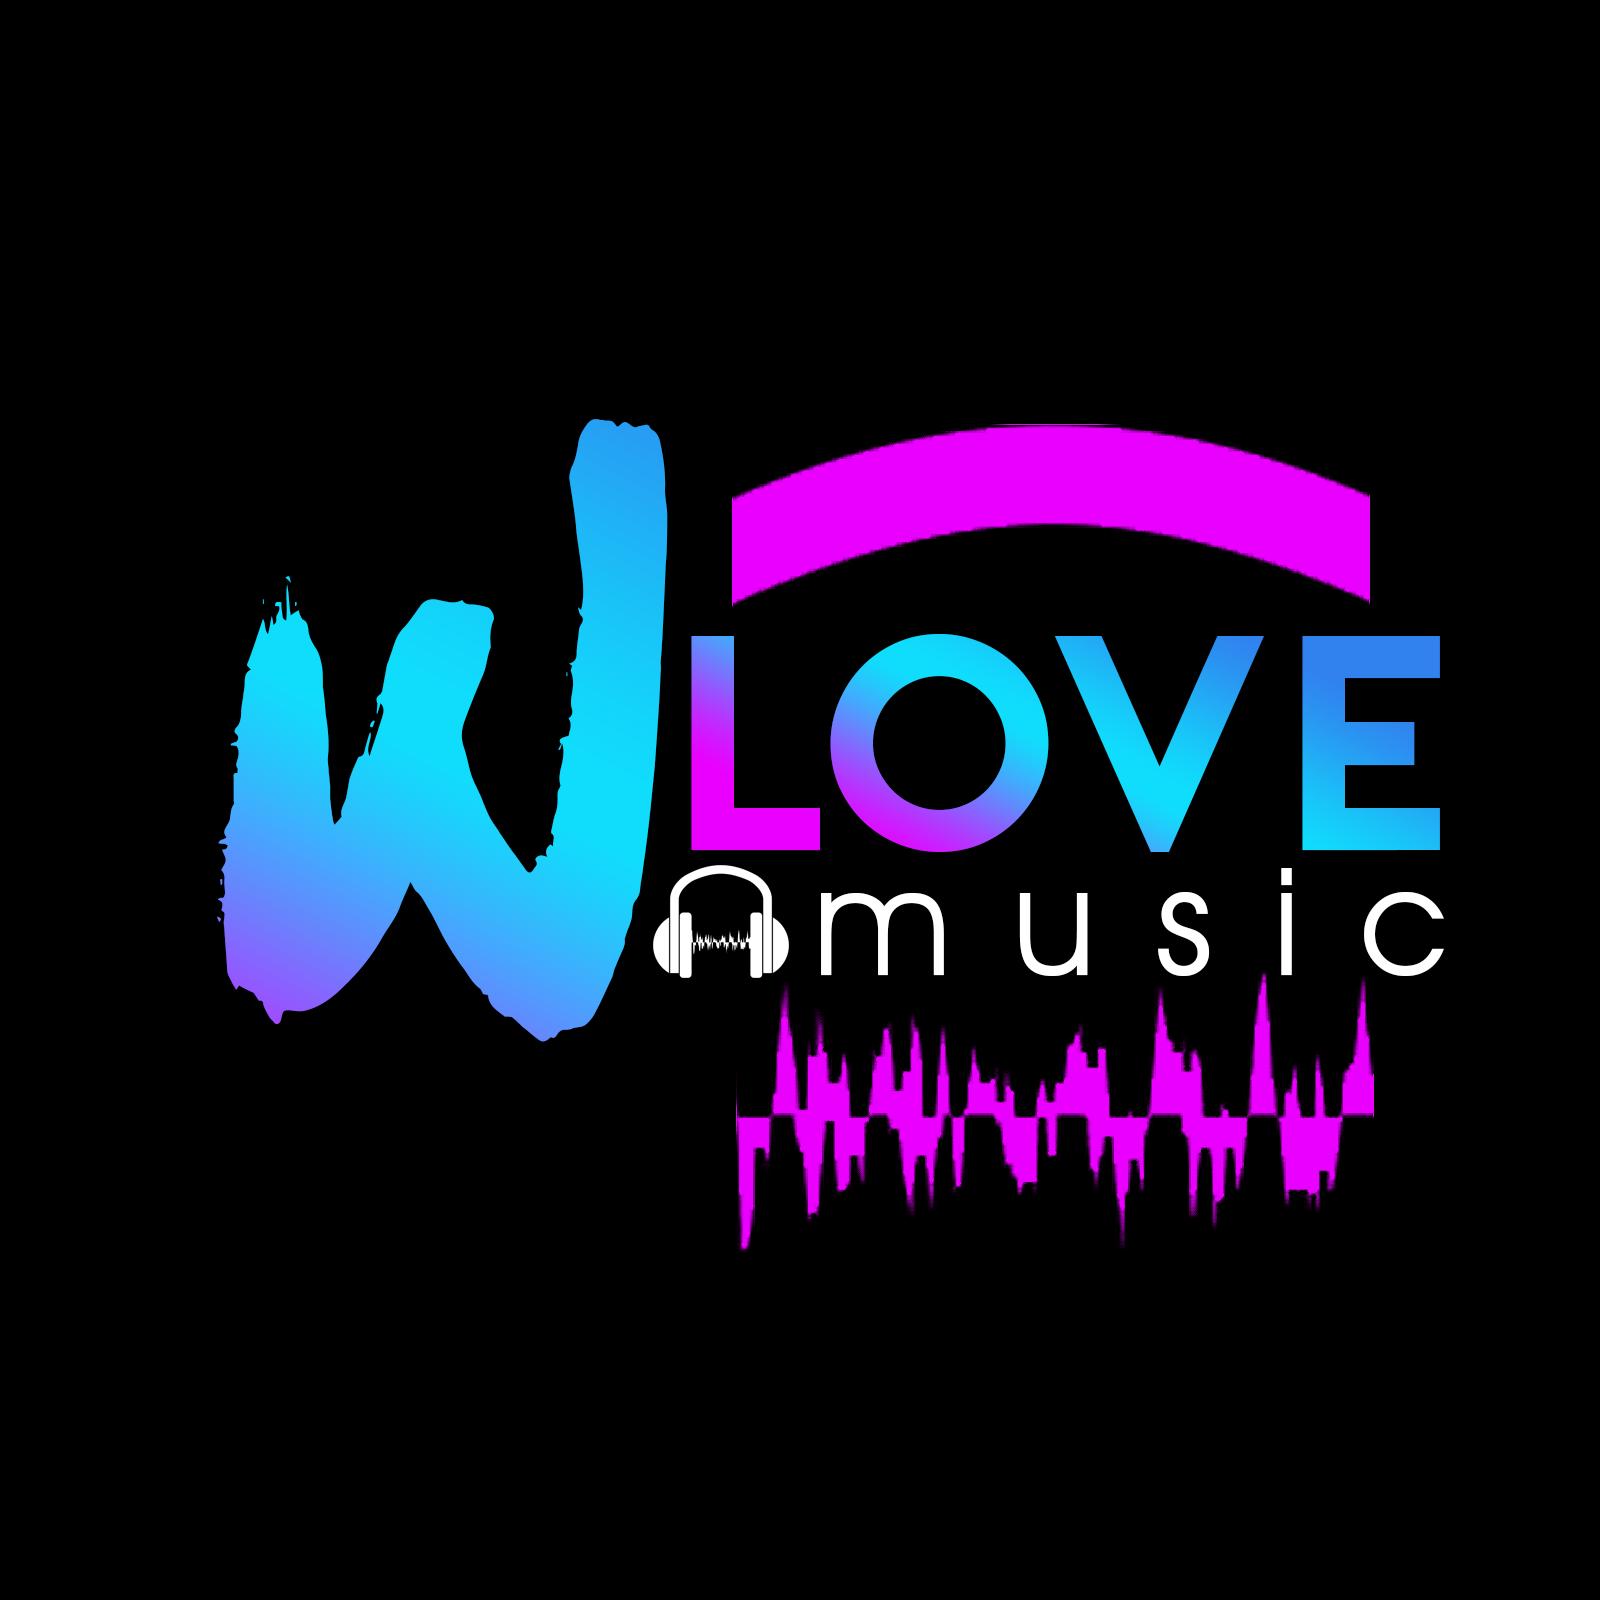 WLove Music logo Music logo, Music, Neon signs